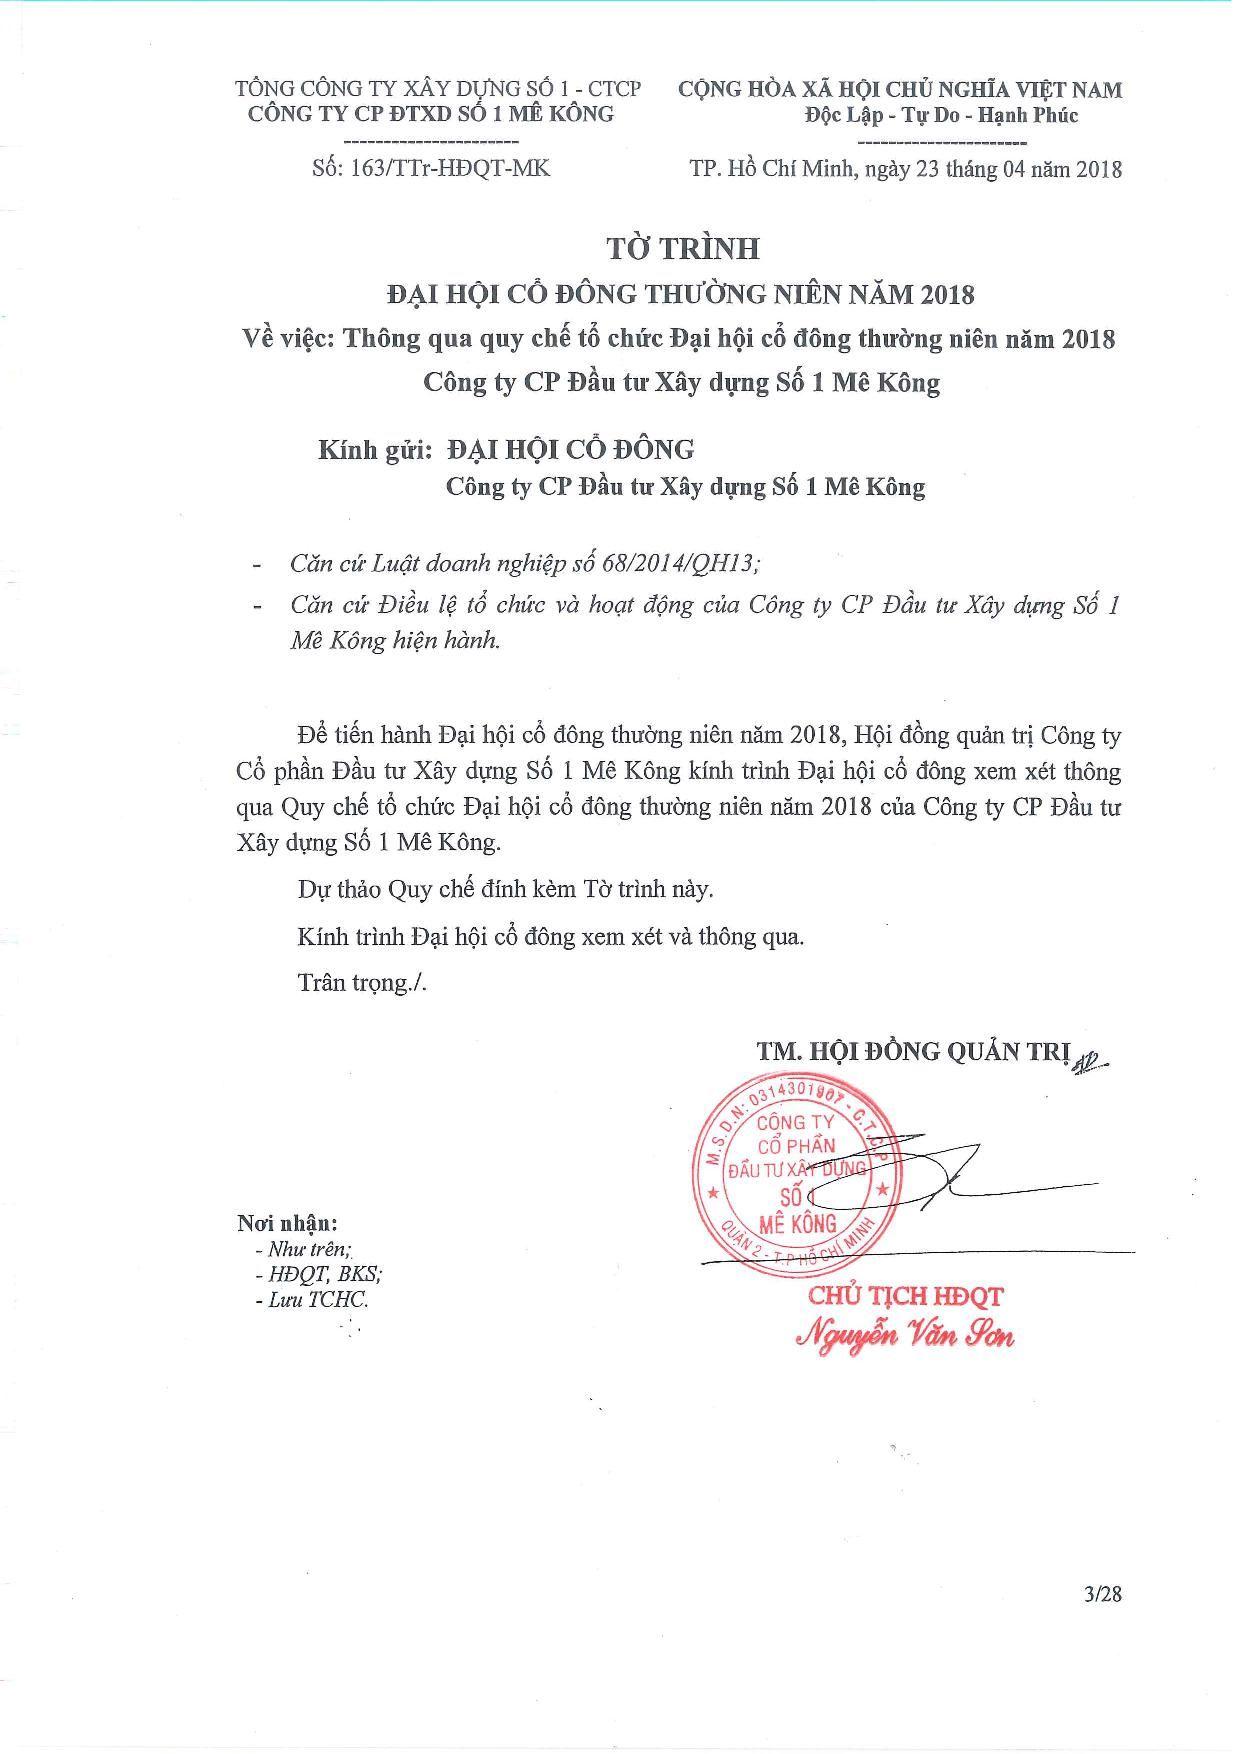 tai-lieu-dhcd-thuong-nien-2018-page (3)